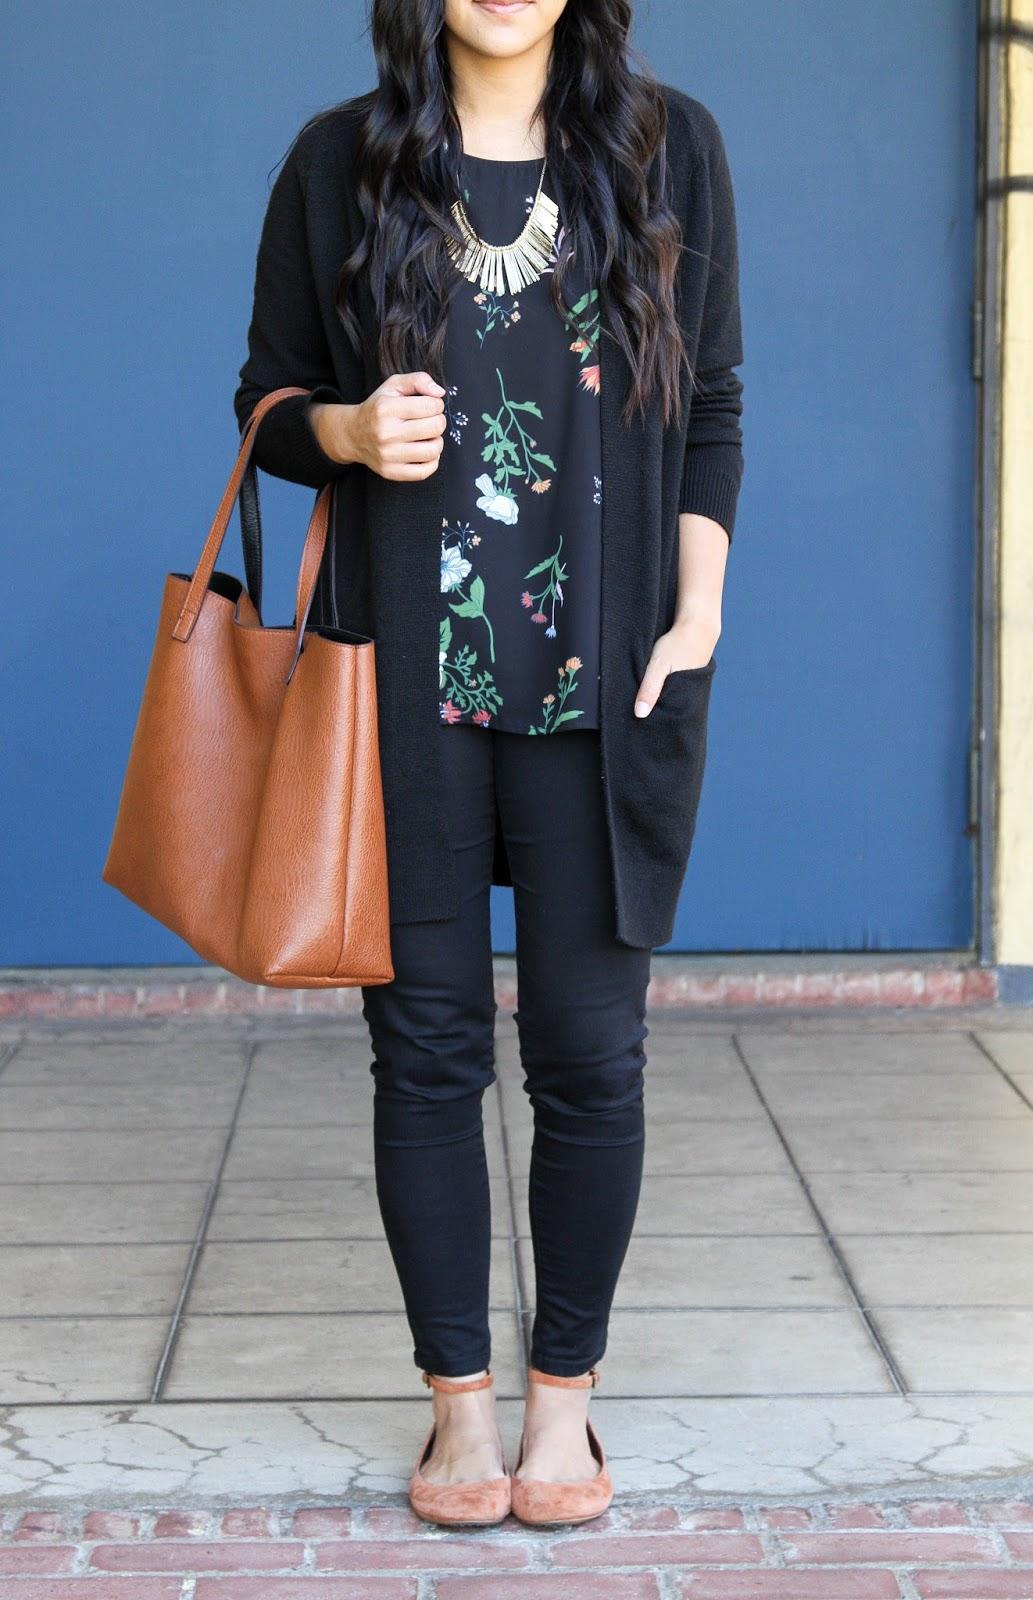 Black Cardigan + Floral Shirt + Tote Bag + Statement Necklace